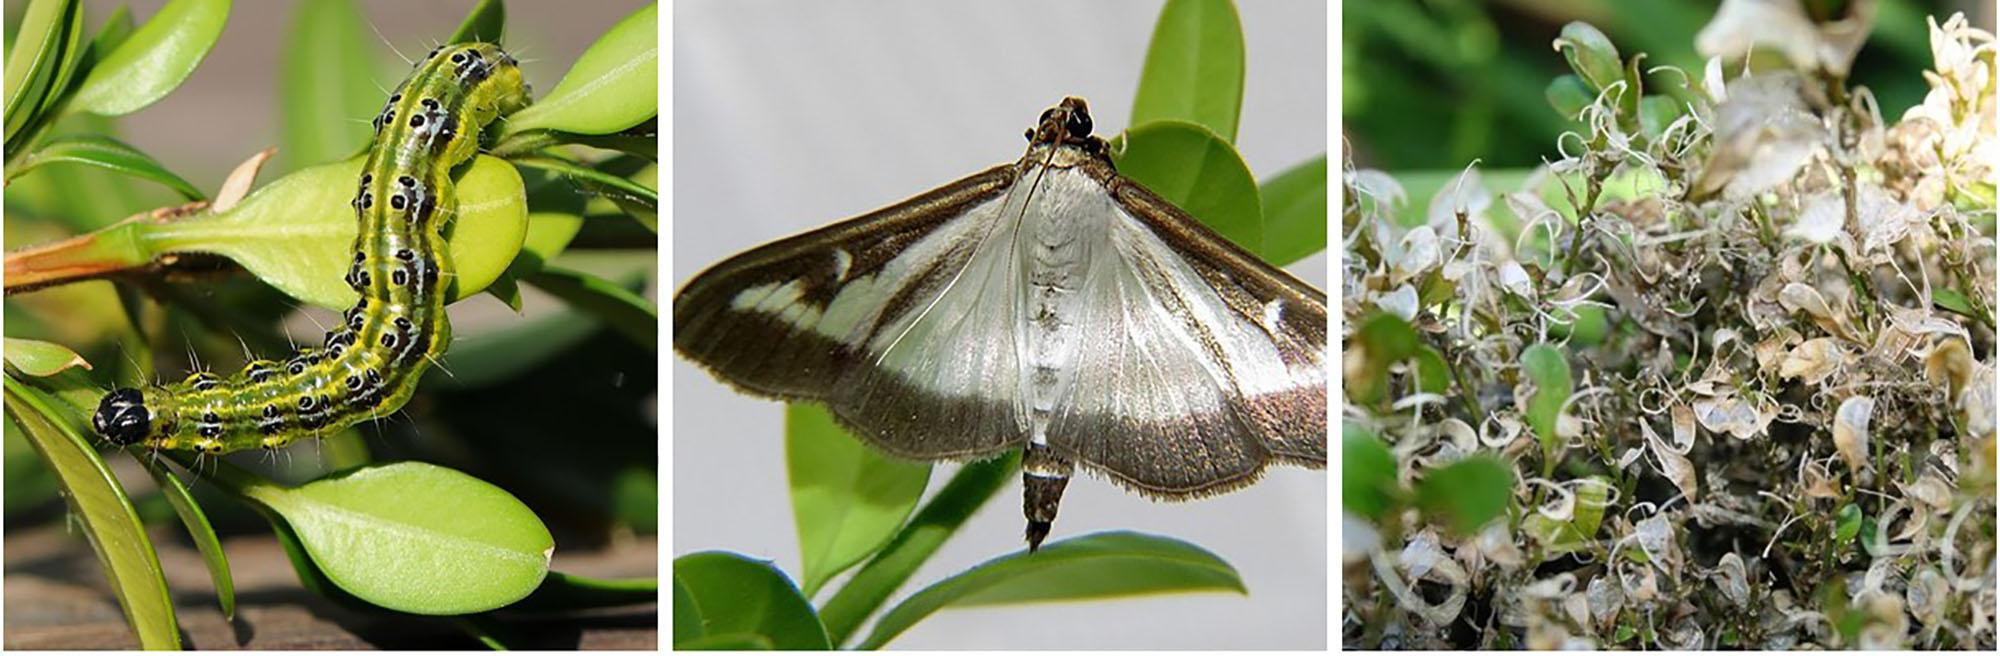 Images of invasive box tree moth.